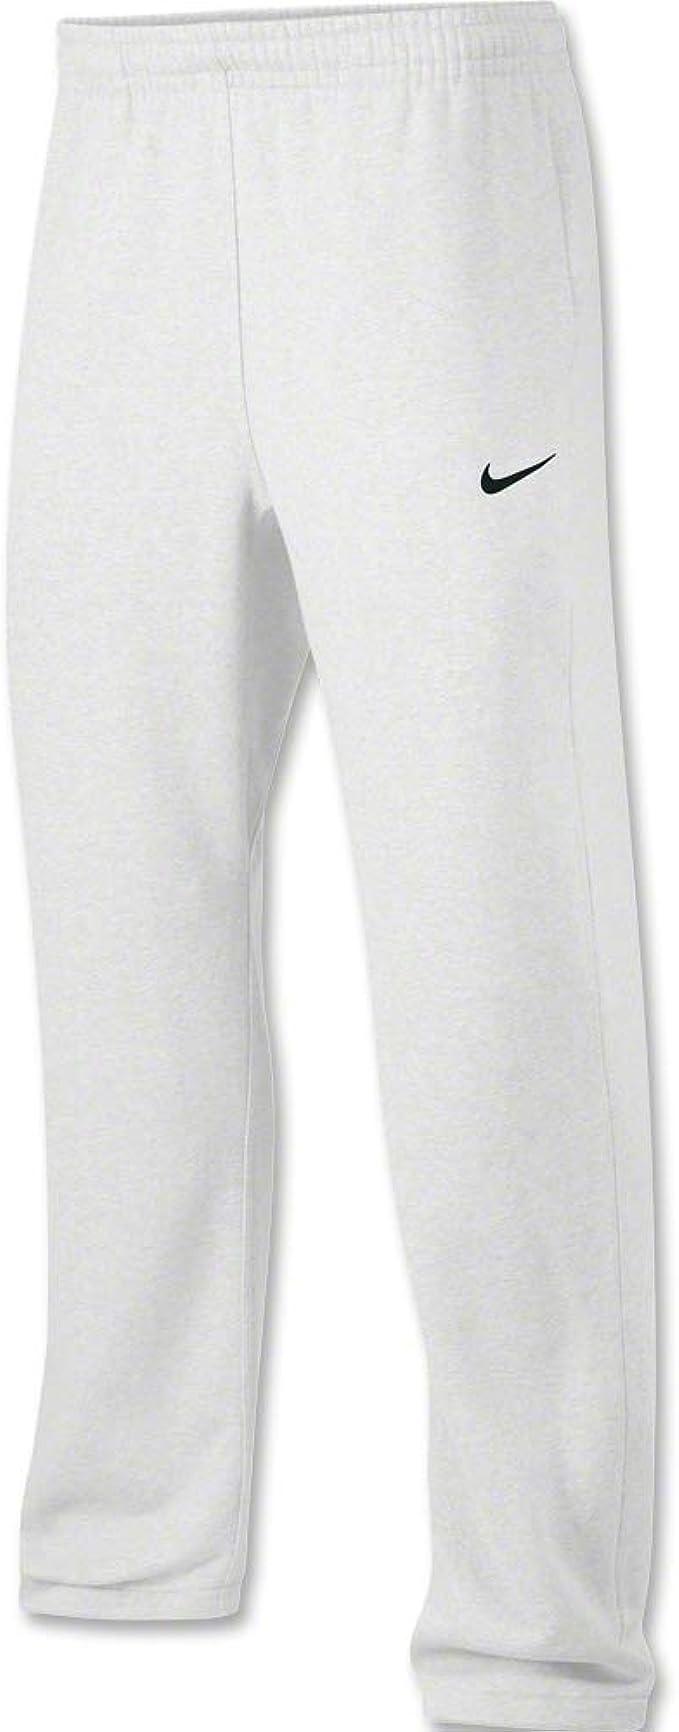 Nike Club Swoosh - Pantalones de chándal para hombre (forro polar ...